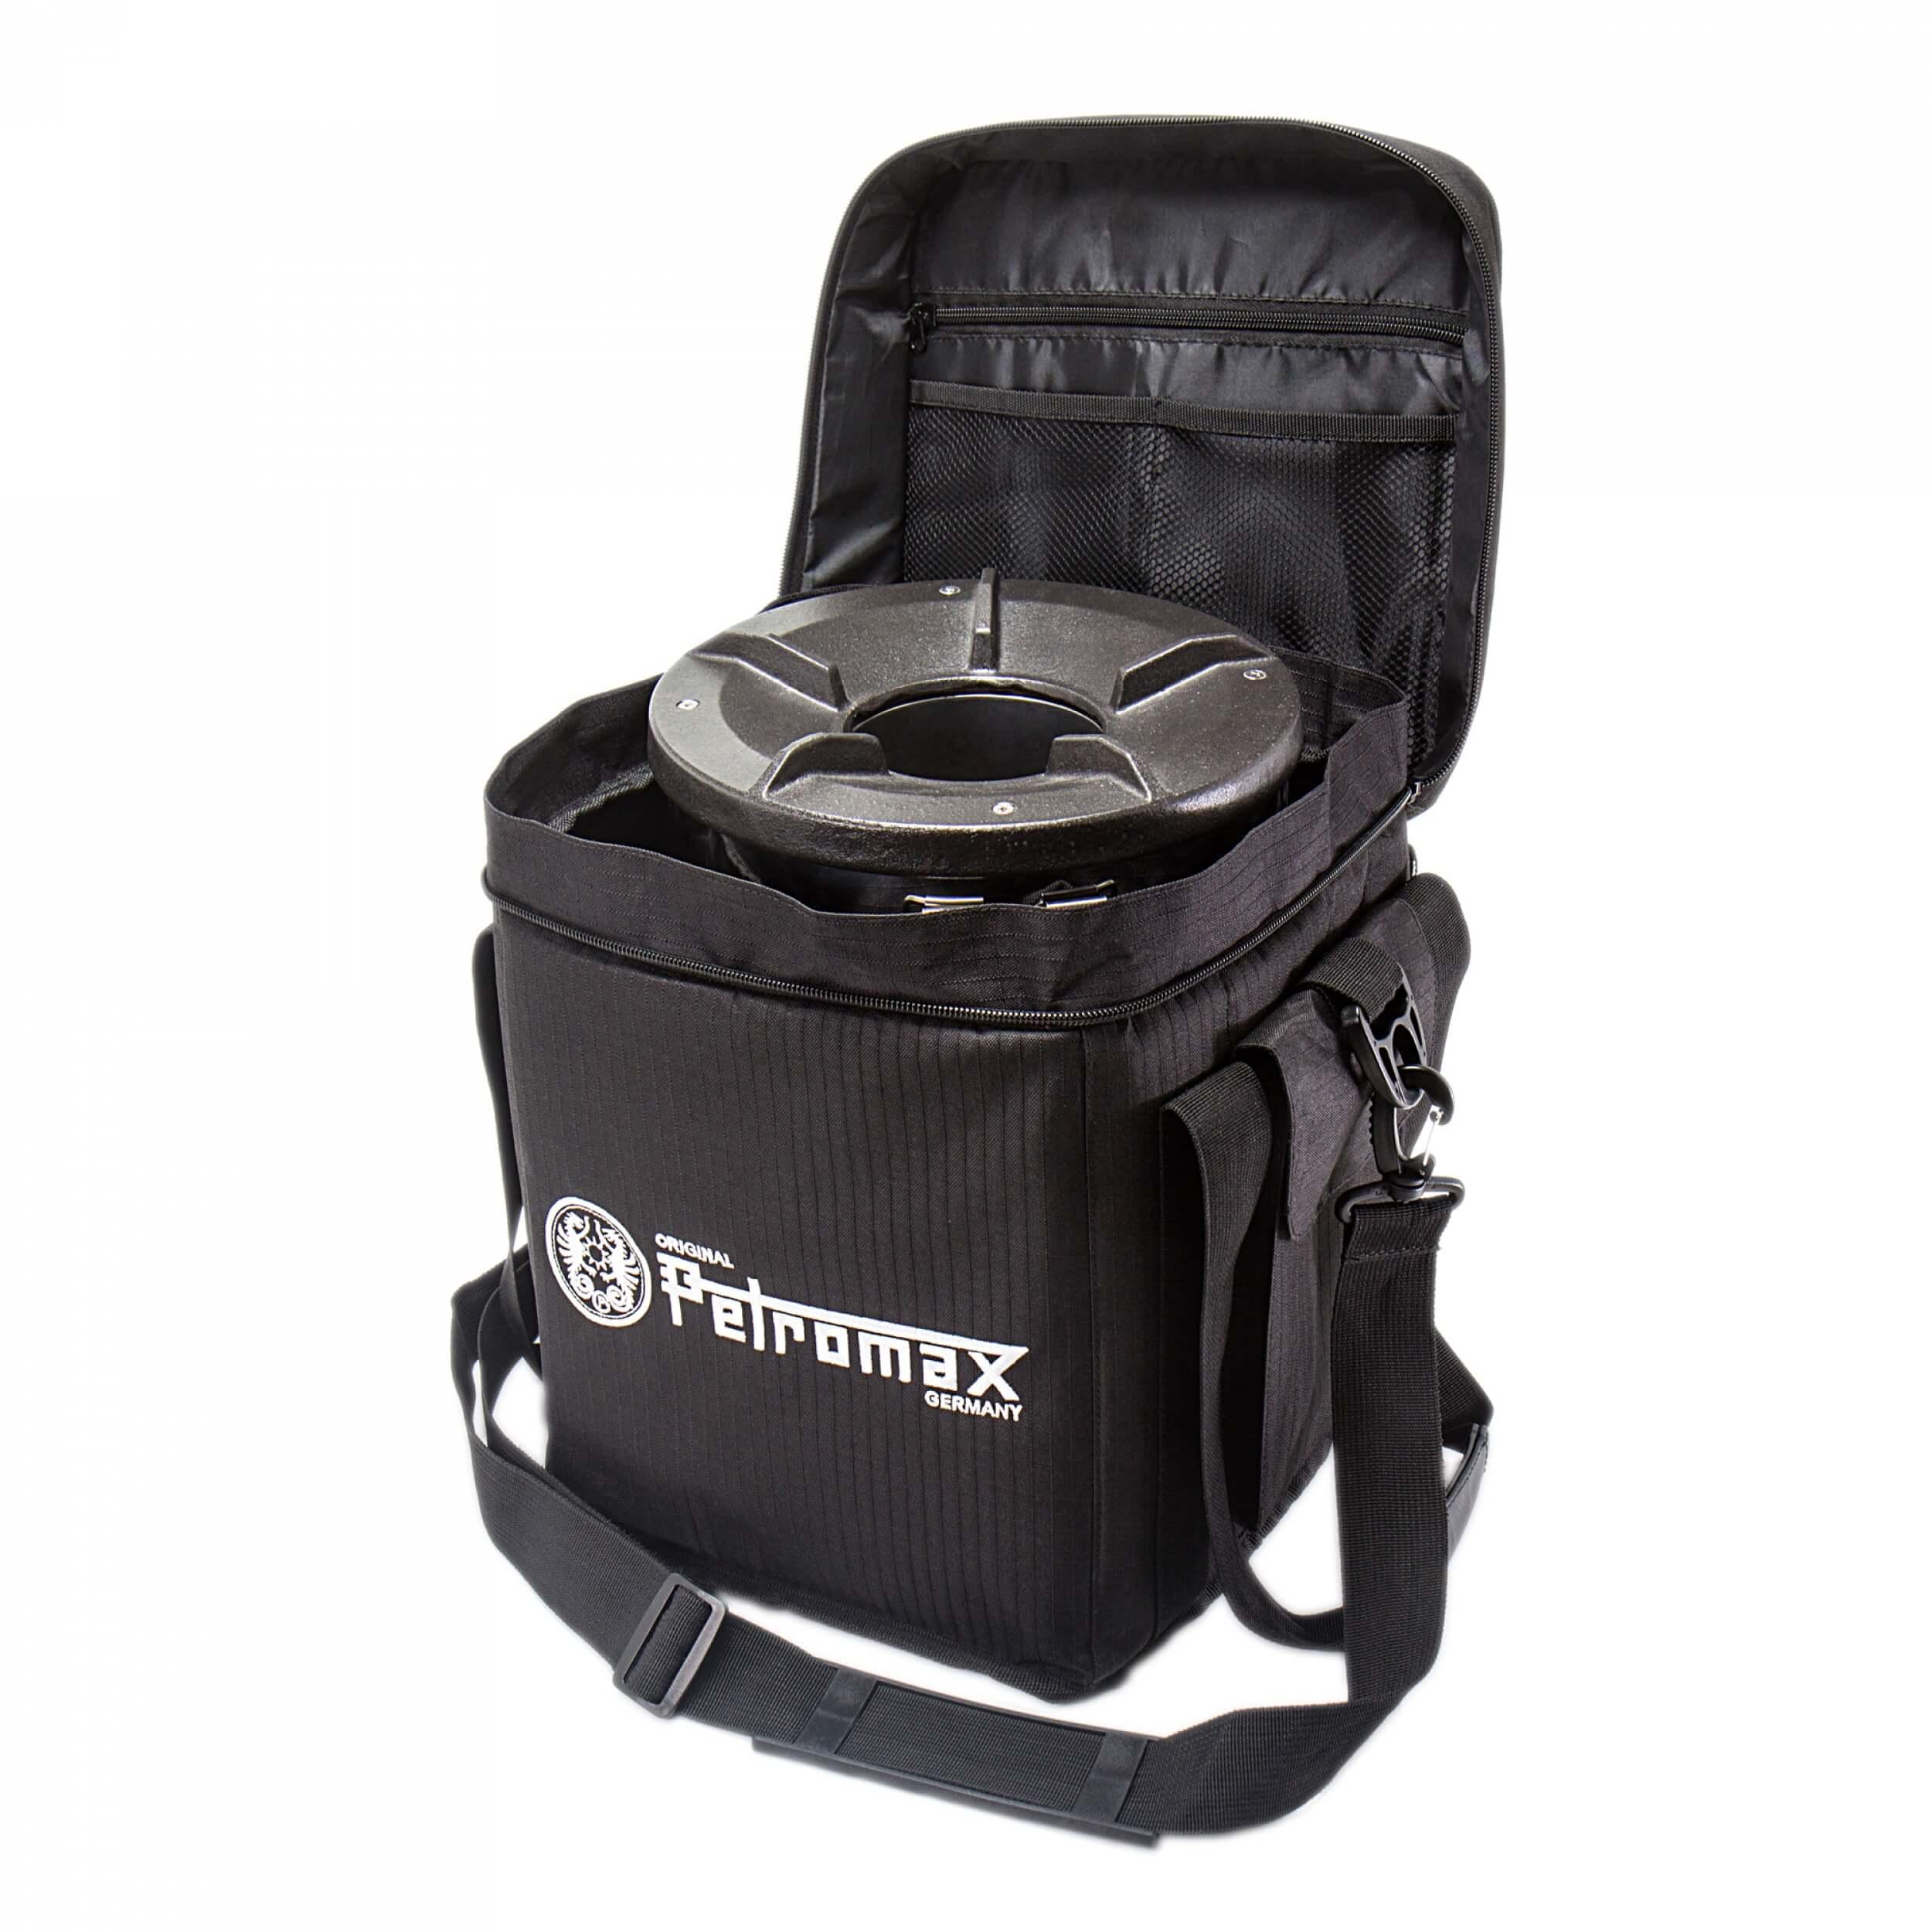 Petromax Transporttasche zum Raketenofen rf33